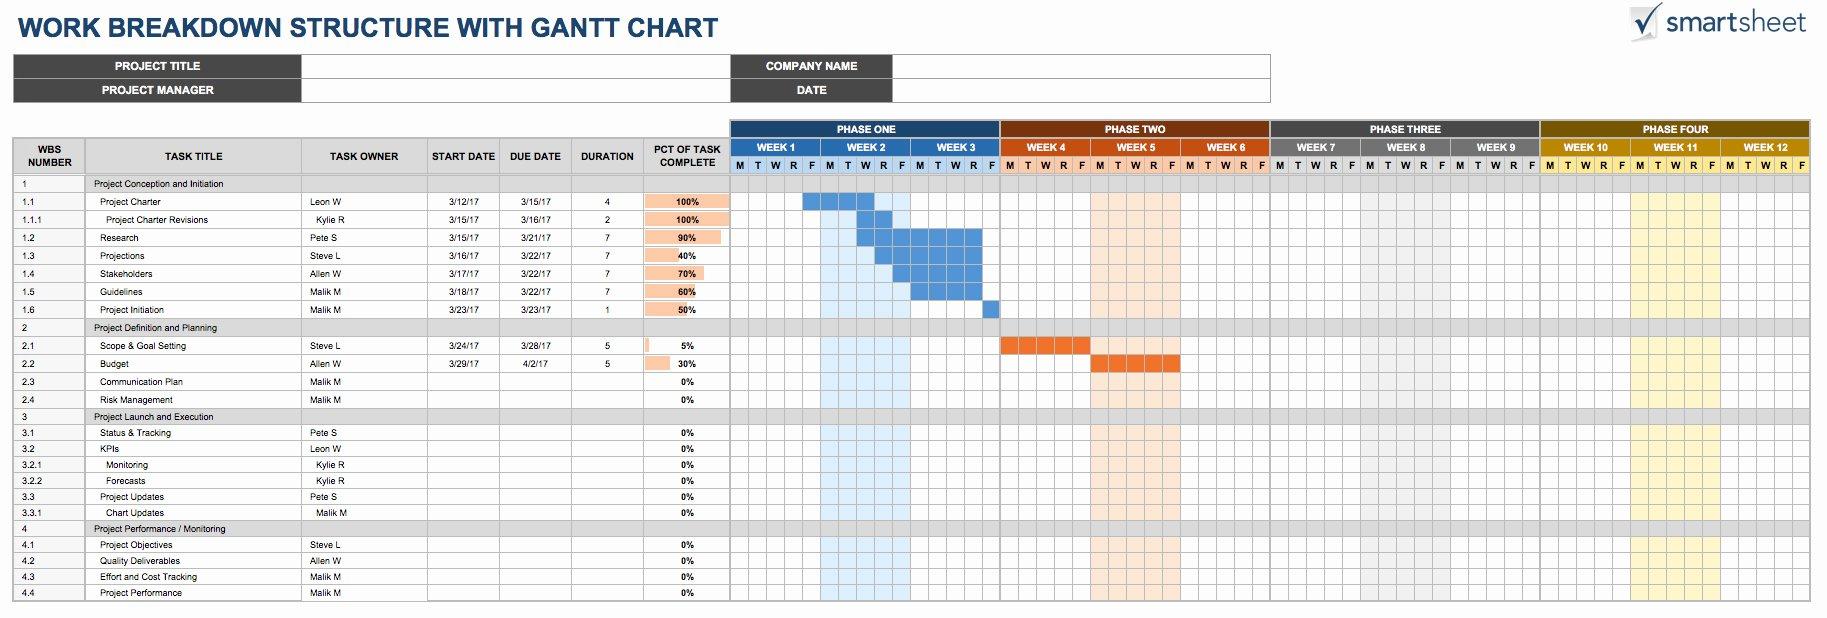 Wedding Project Plan Excel Unique Free Work Breakdown Structure Templatessmartsheet